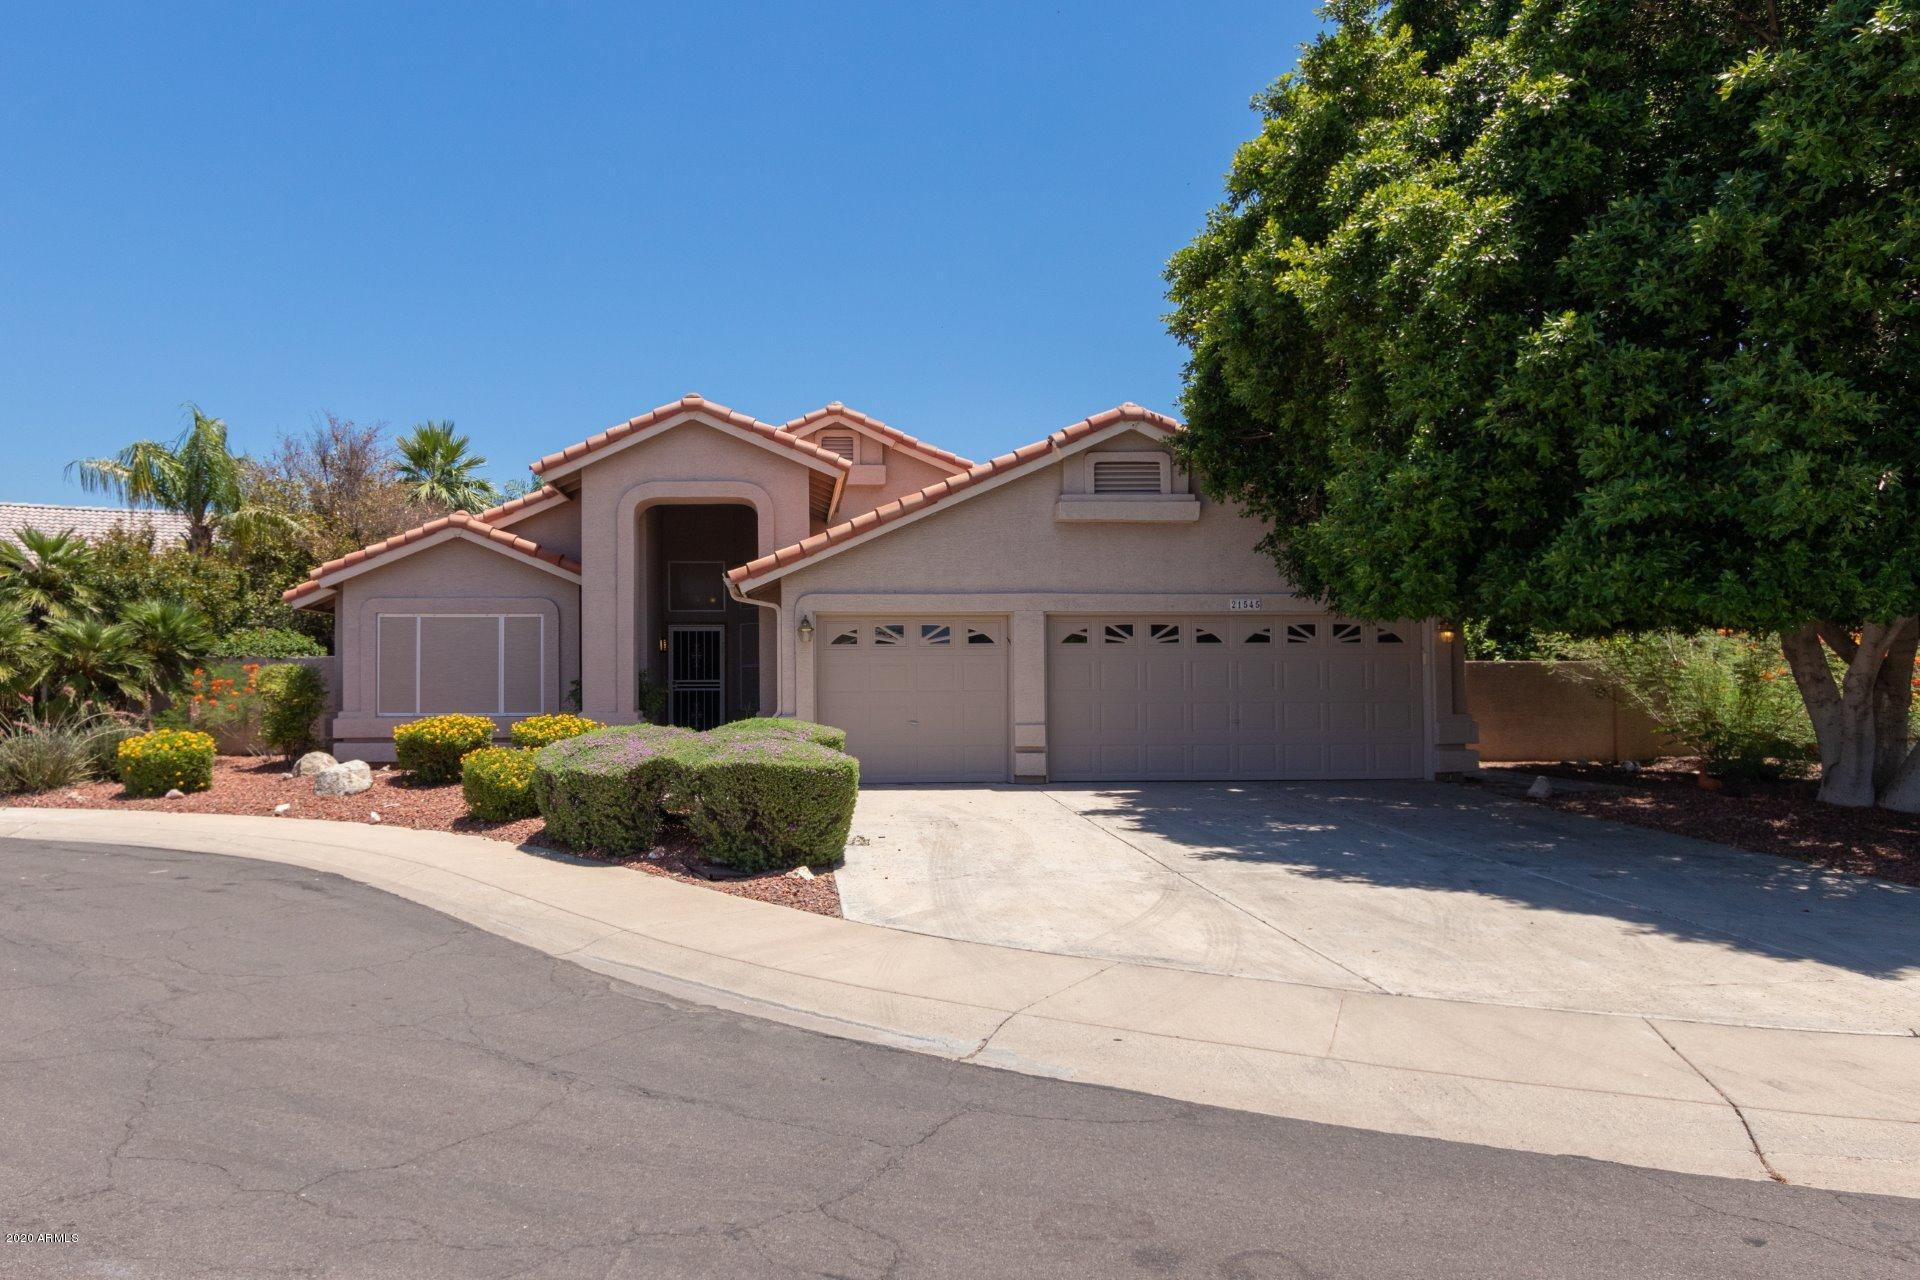 Photo of 21545 N 57TH Avenue, Glendale, AZ 85308